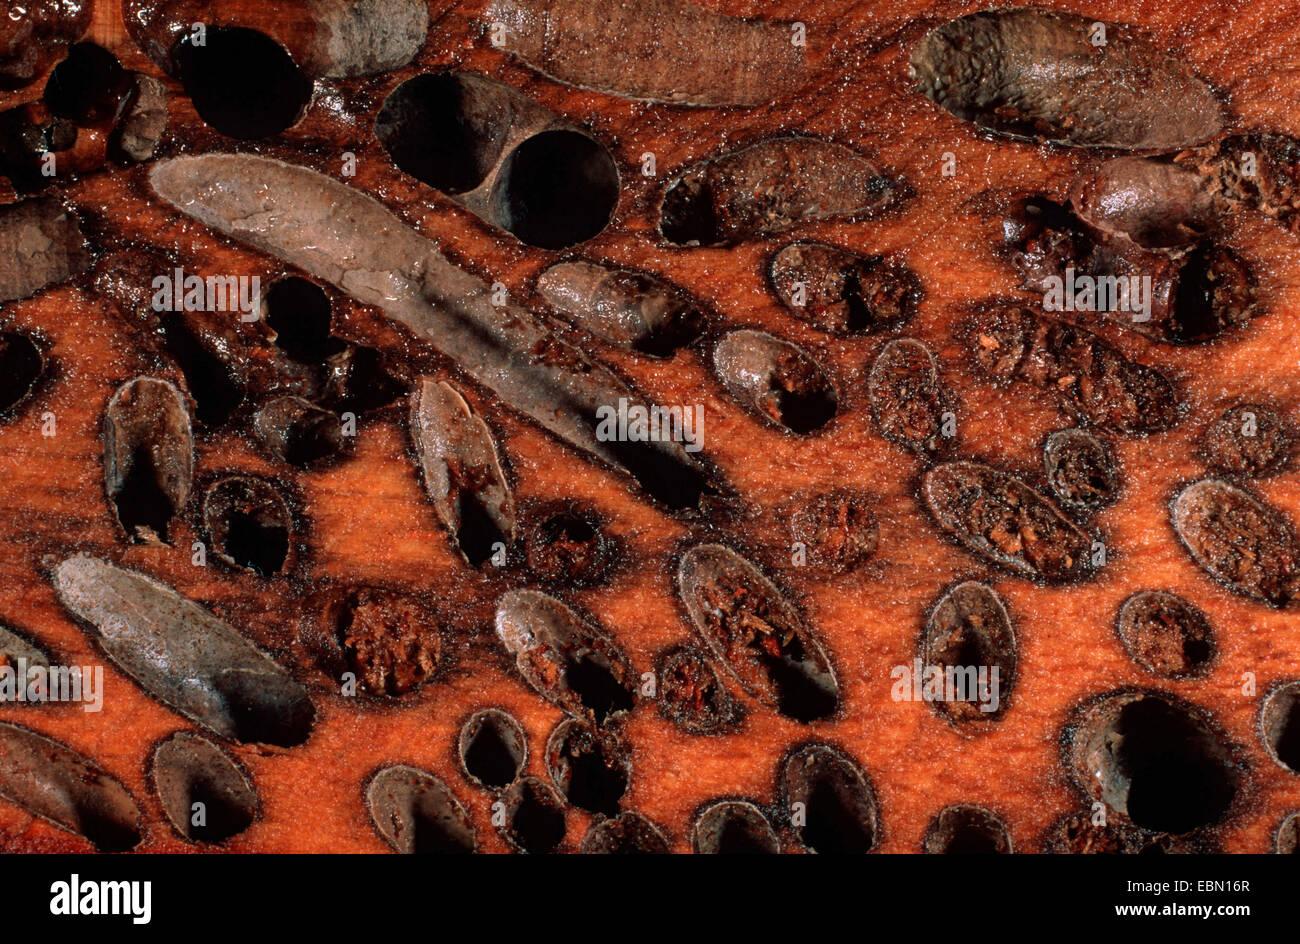 Teredo Stock Photos & Teredo Stock Images - Alamy